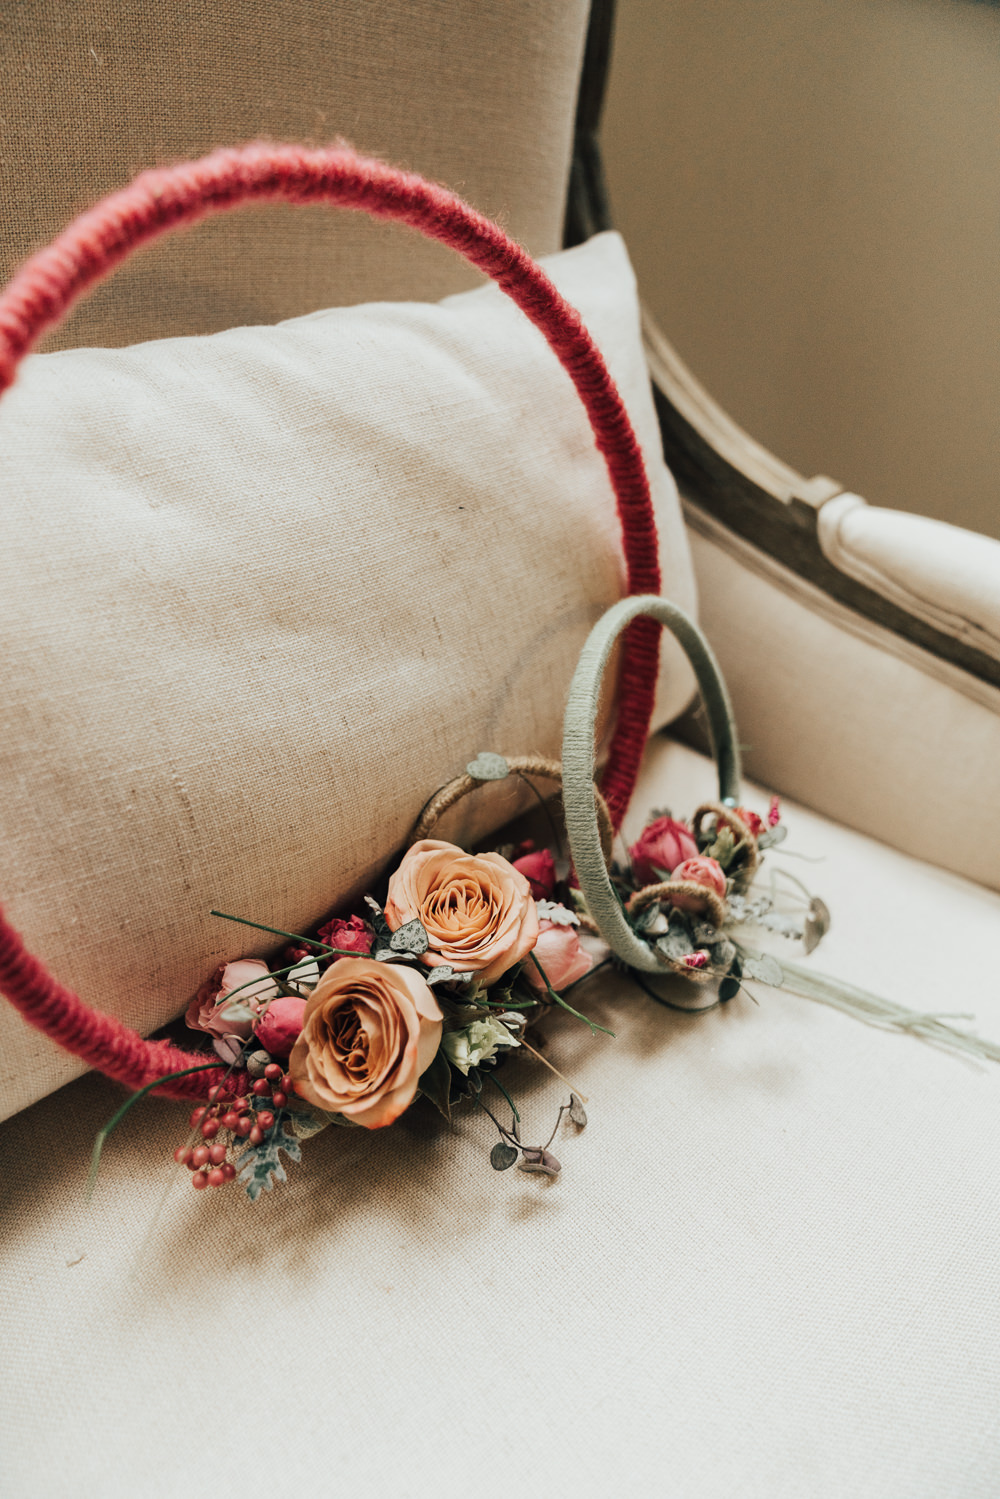 Wreath Flowers Floral Bouquet Bride Bridal Hoop Wedding Ideas Rebecca Carpenter Photography